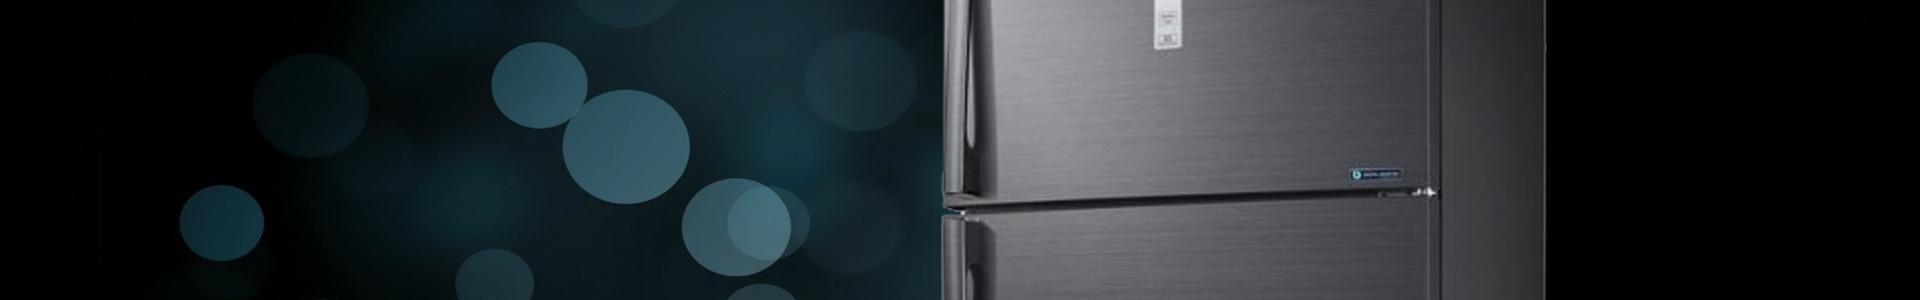 Refrigerator Parts